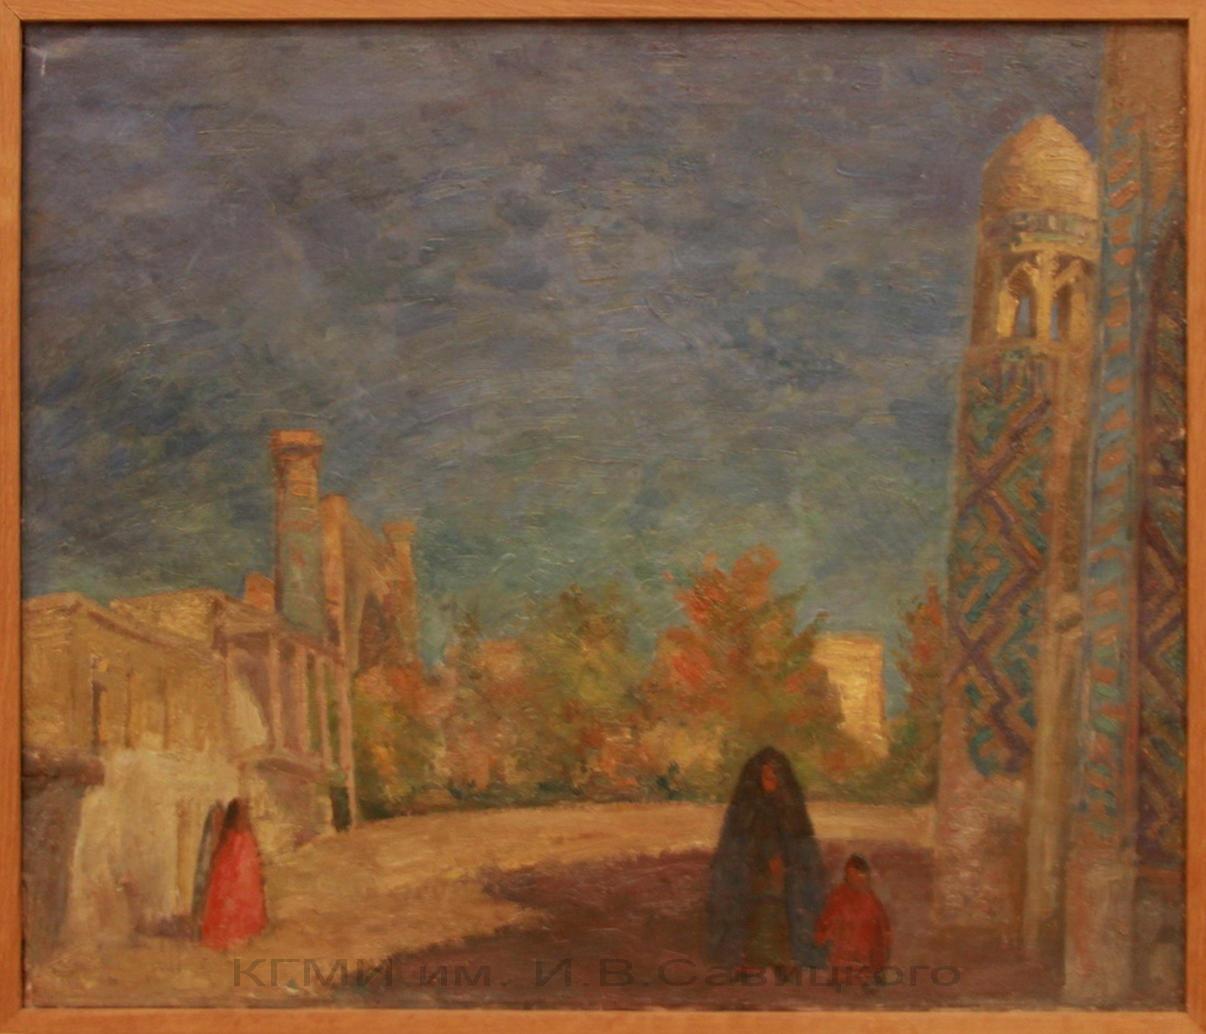 Фальк Р.Р. (1886-1958). На площади в Самарканде 1 половина 20 века.